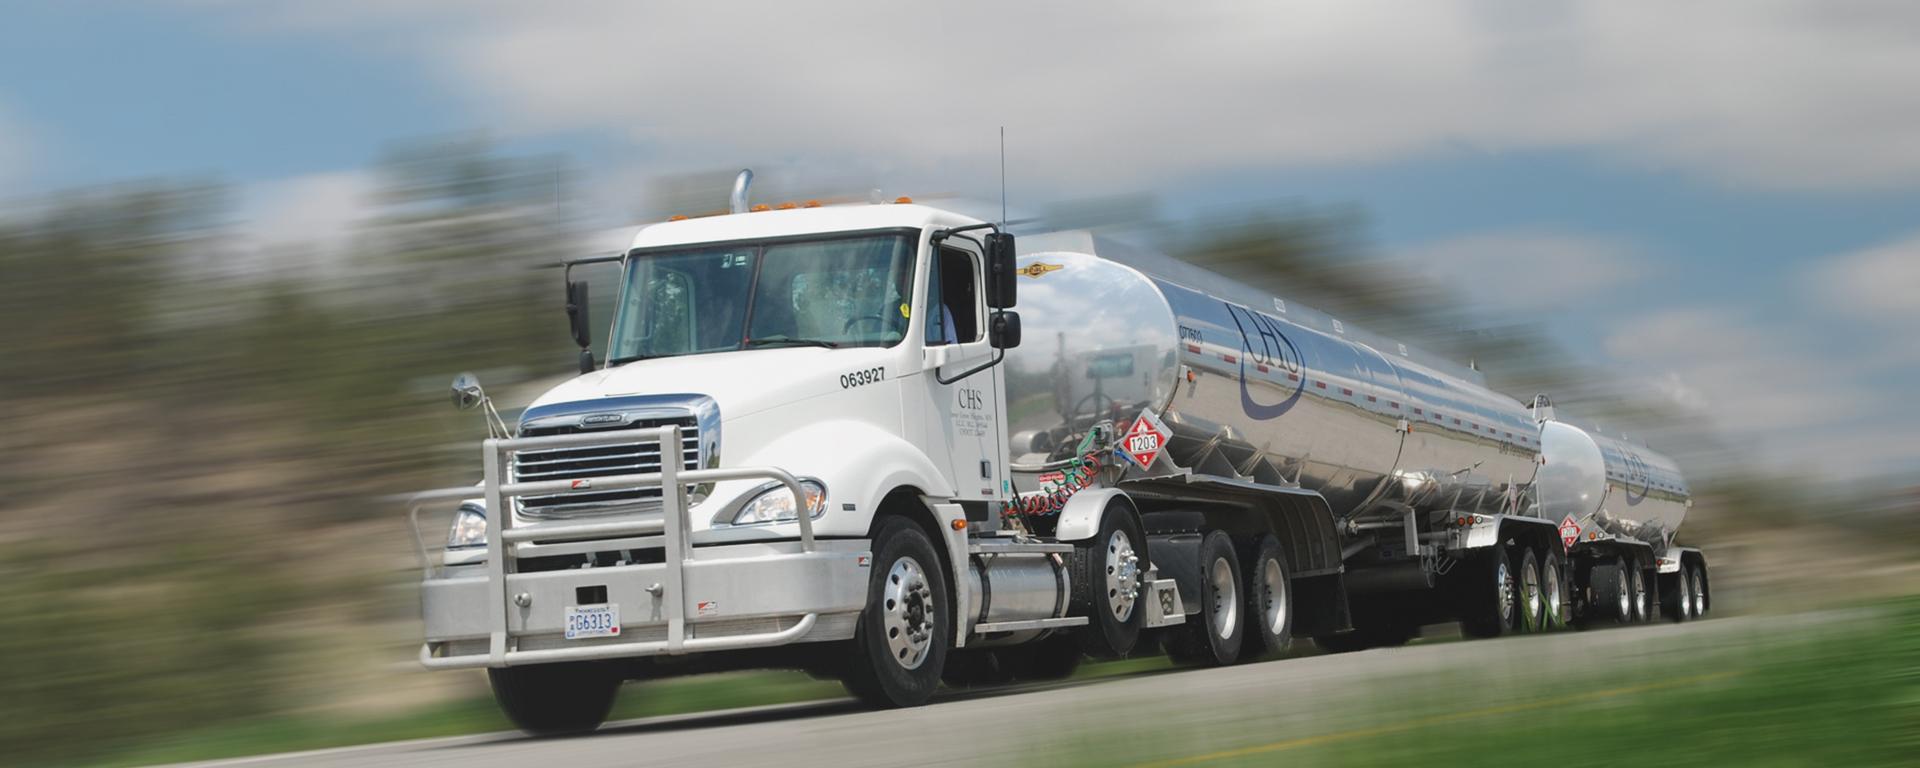 CHS TransportationMilitary Hiring Program -